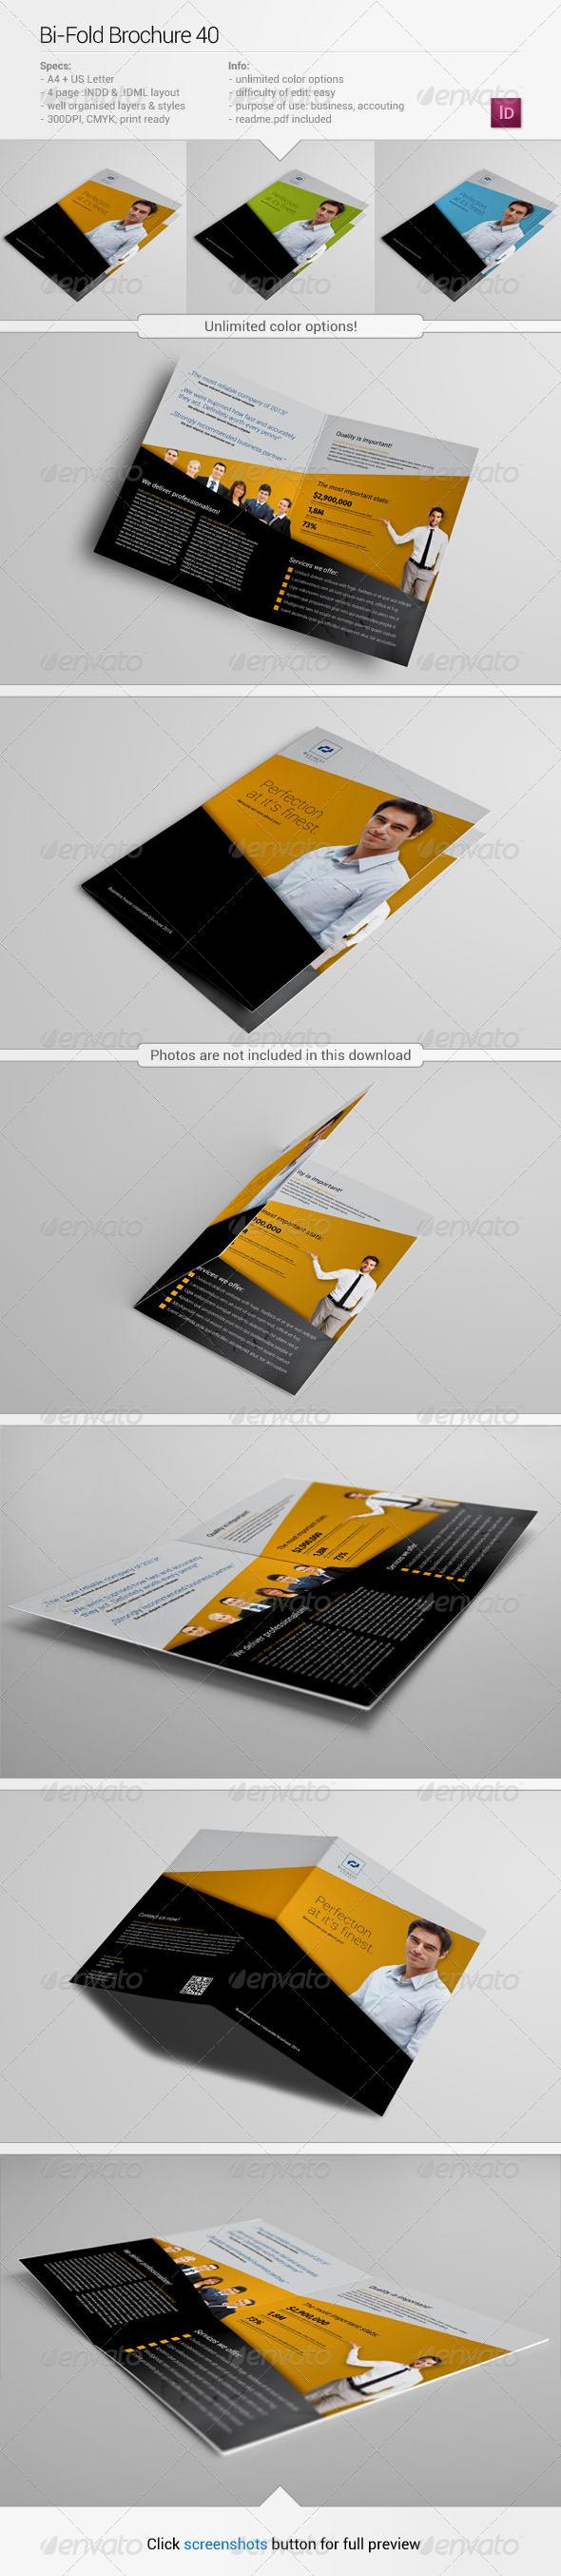 GraphicRiver Bi-Fold Brochure 40 6156917